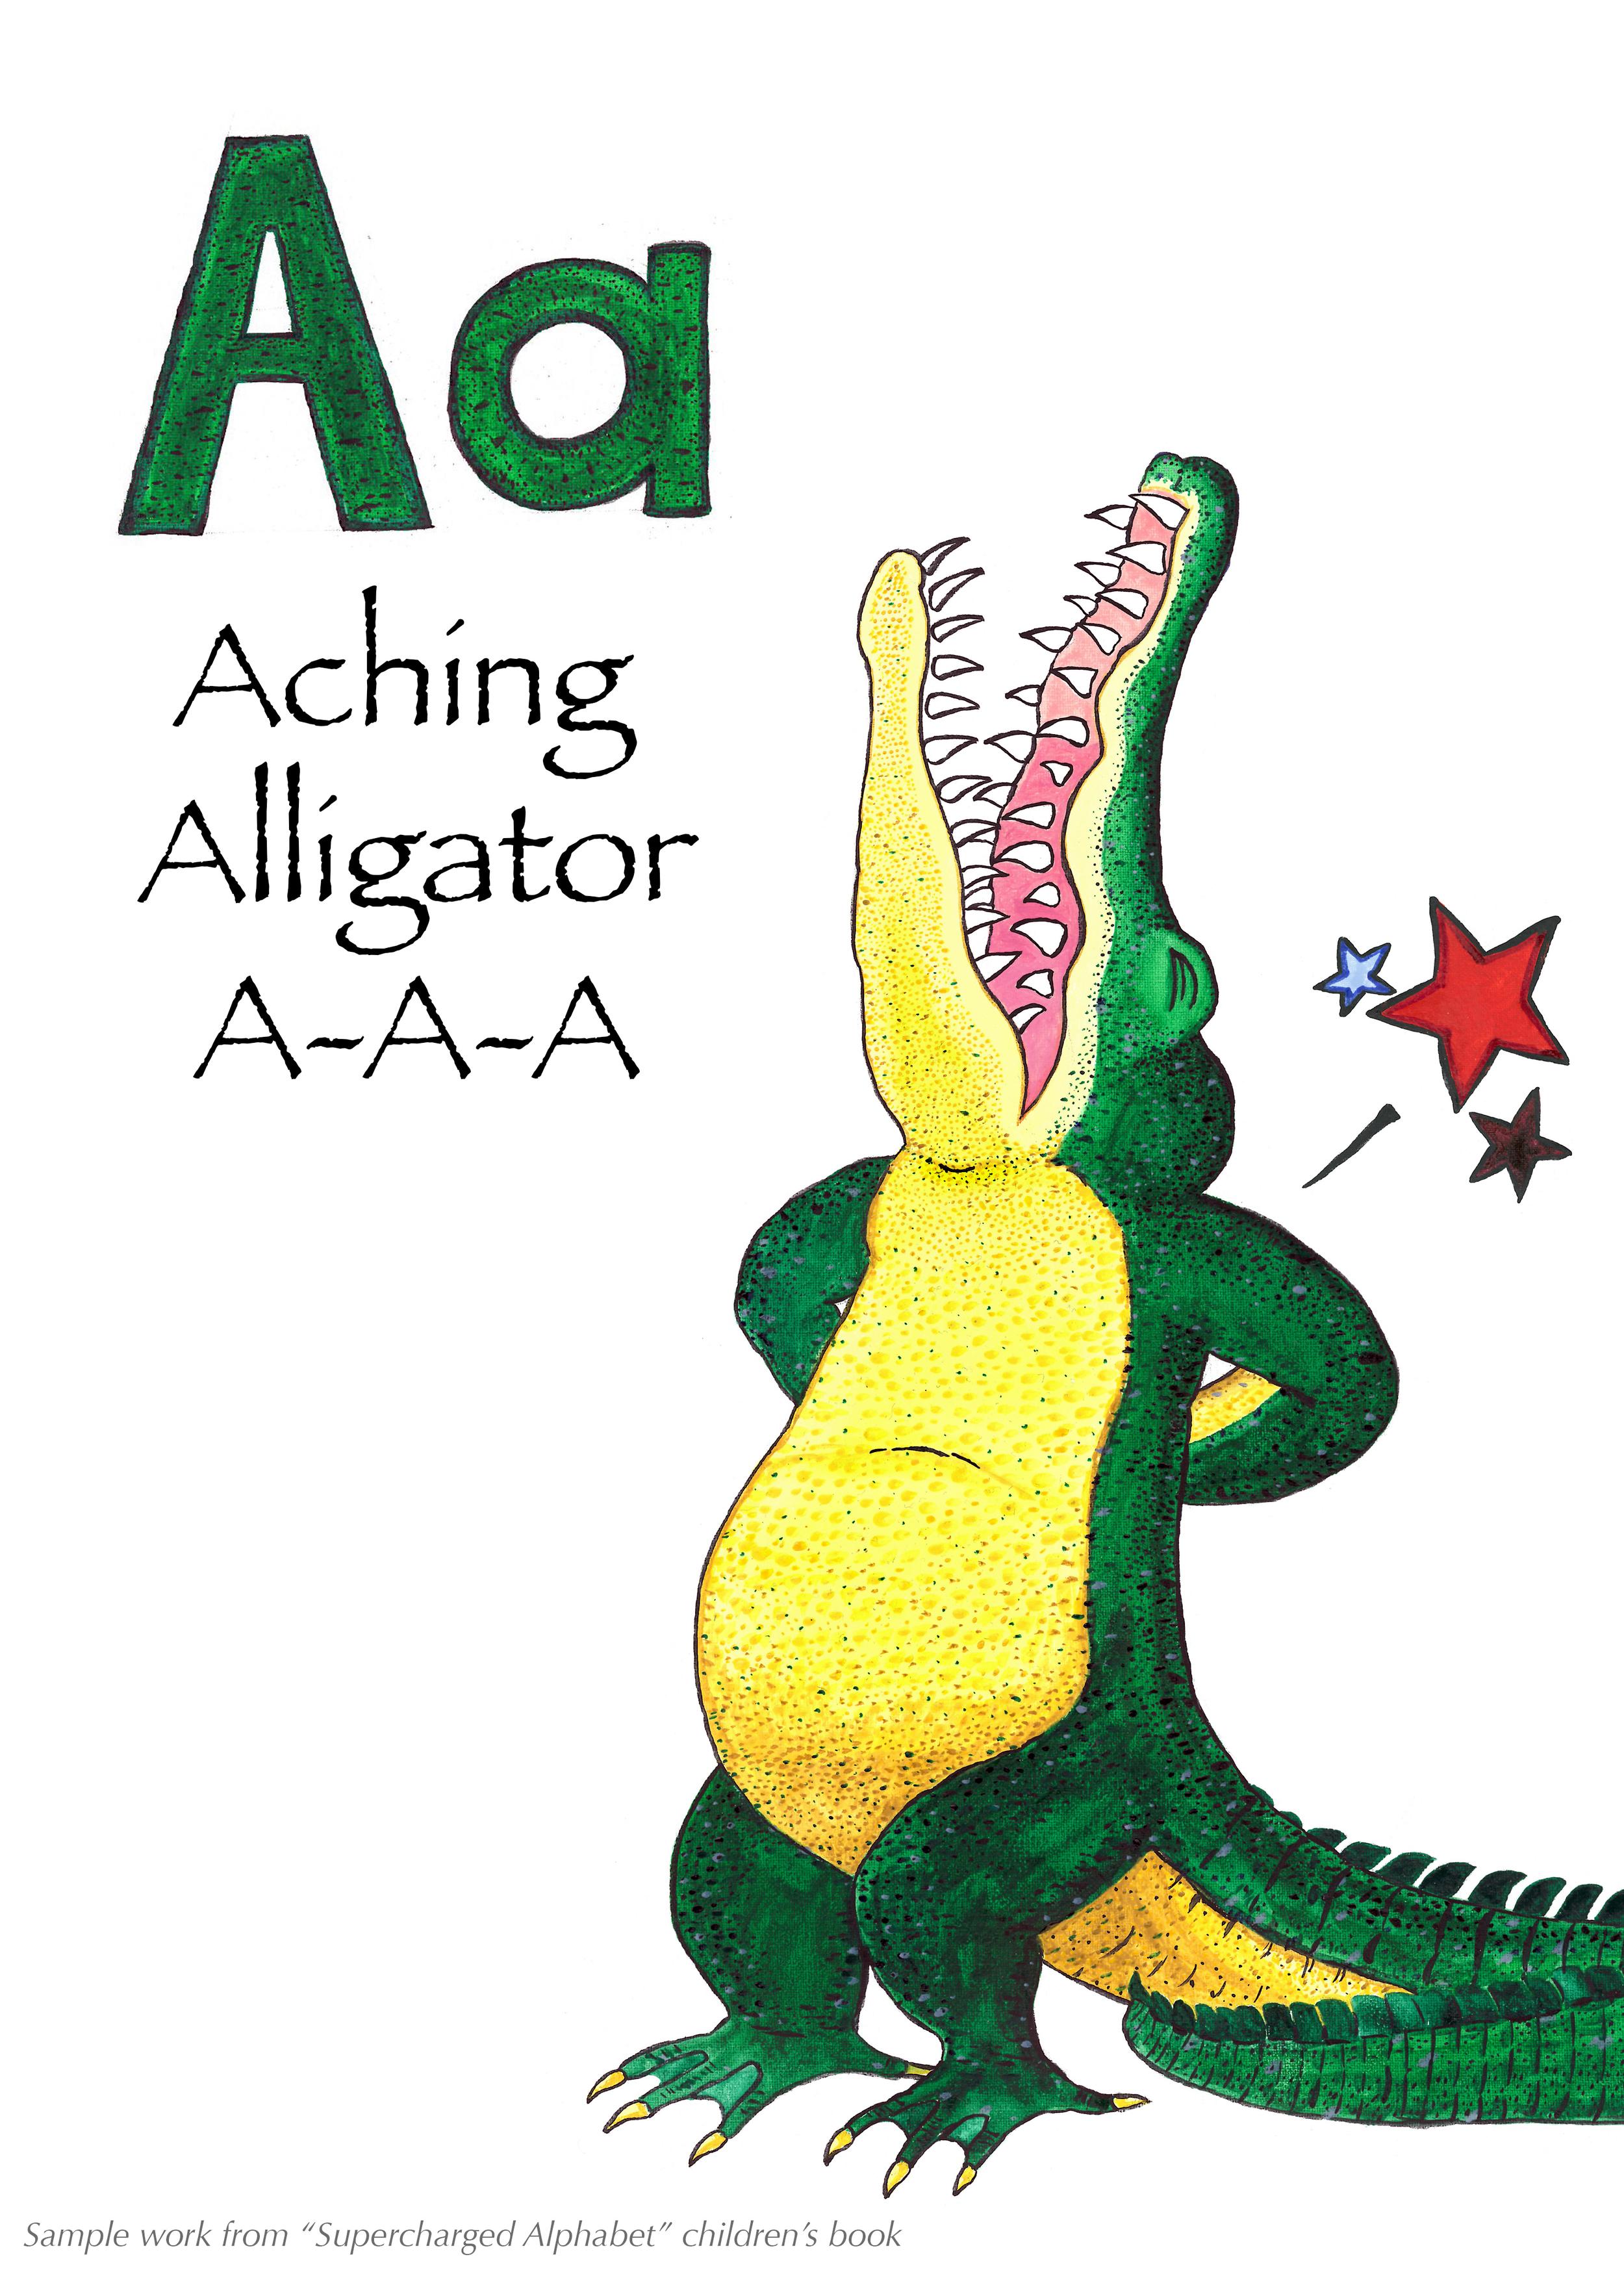 Alligator_copy2.jpg